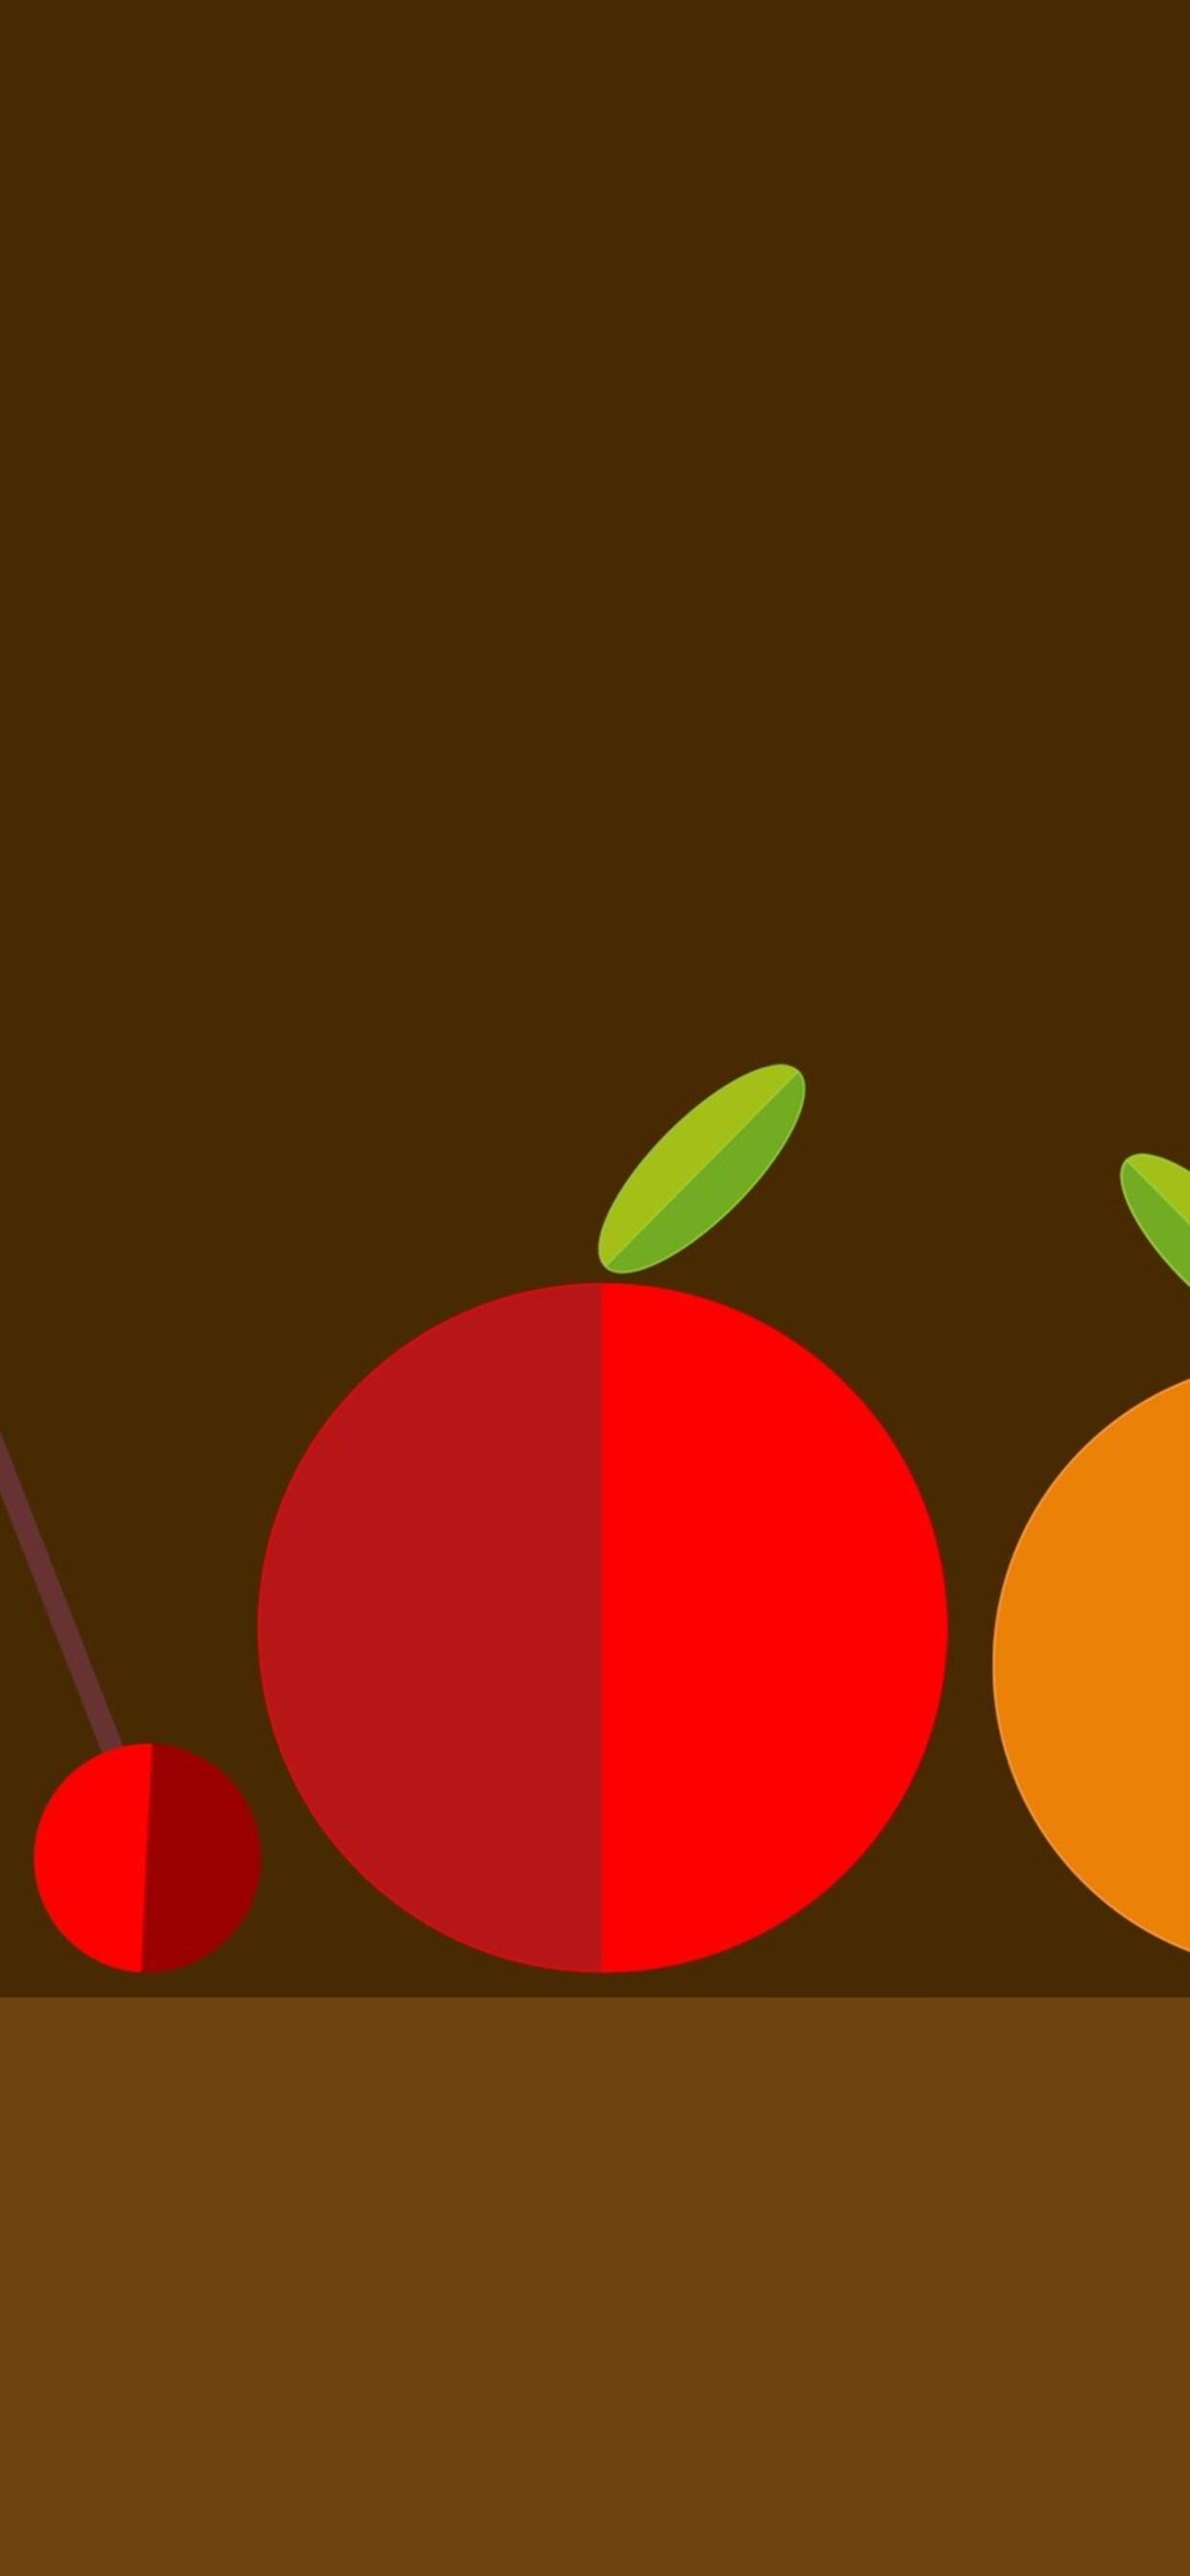 1242x2688 Fruits Minimalism Iphone Xs Max Hd 4k Wallpapers